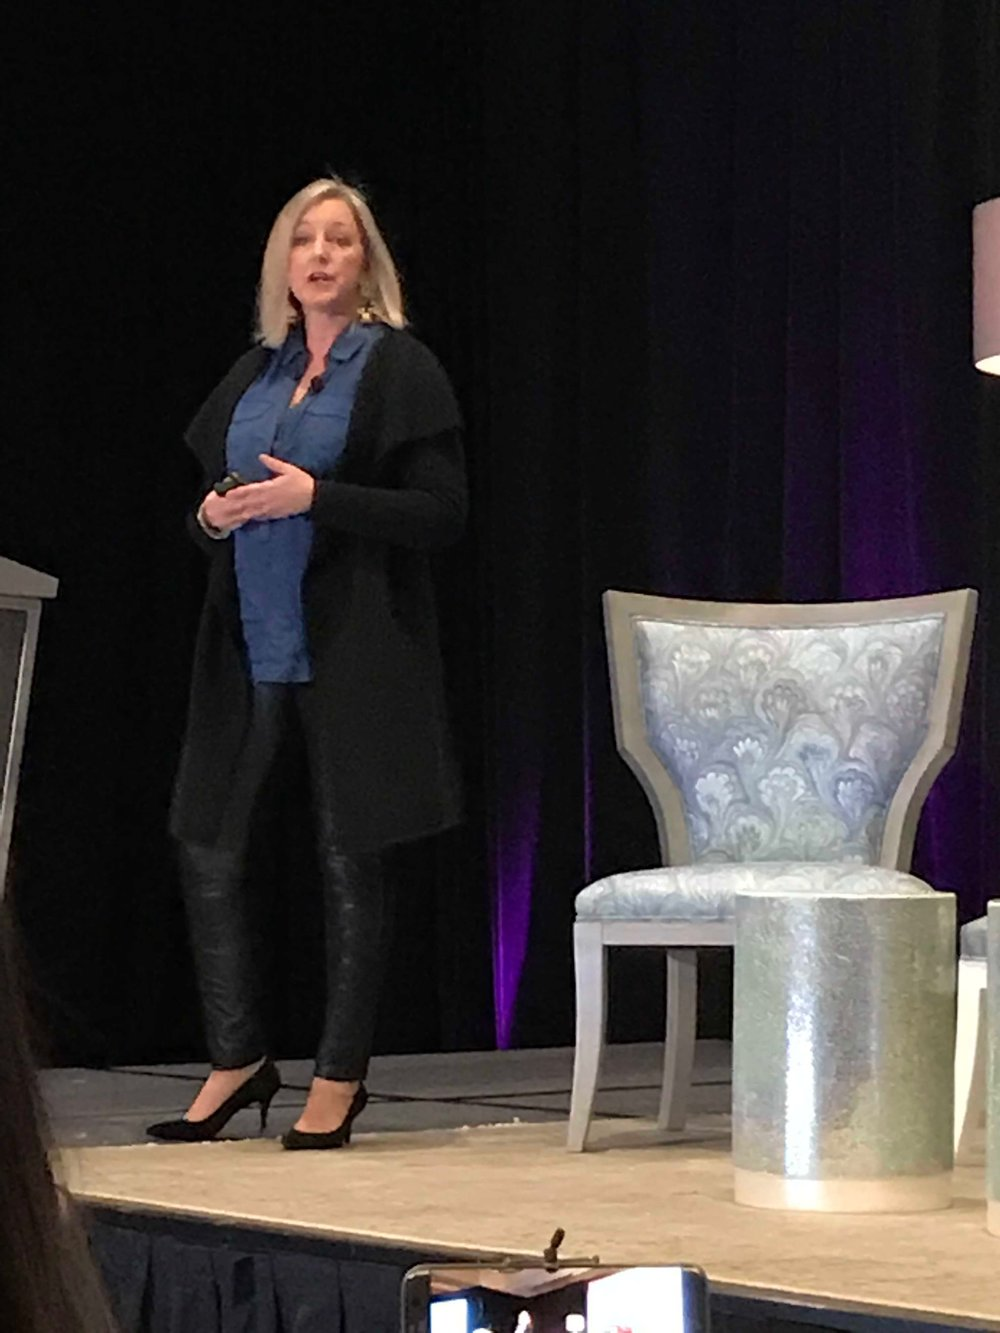 DAY 1 Recap: INCOME FUNNELS FOR YOUR BUSINESS: MONETIZING YOUR MARKETING PLAN. : Deborah von Donop